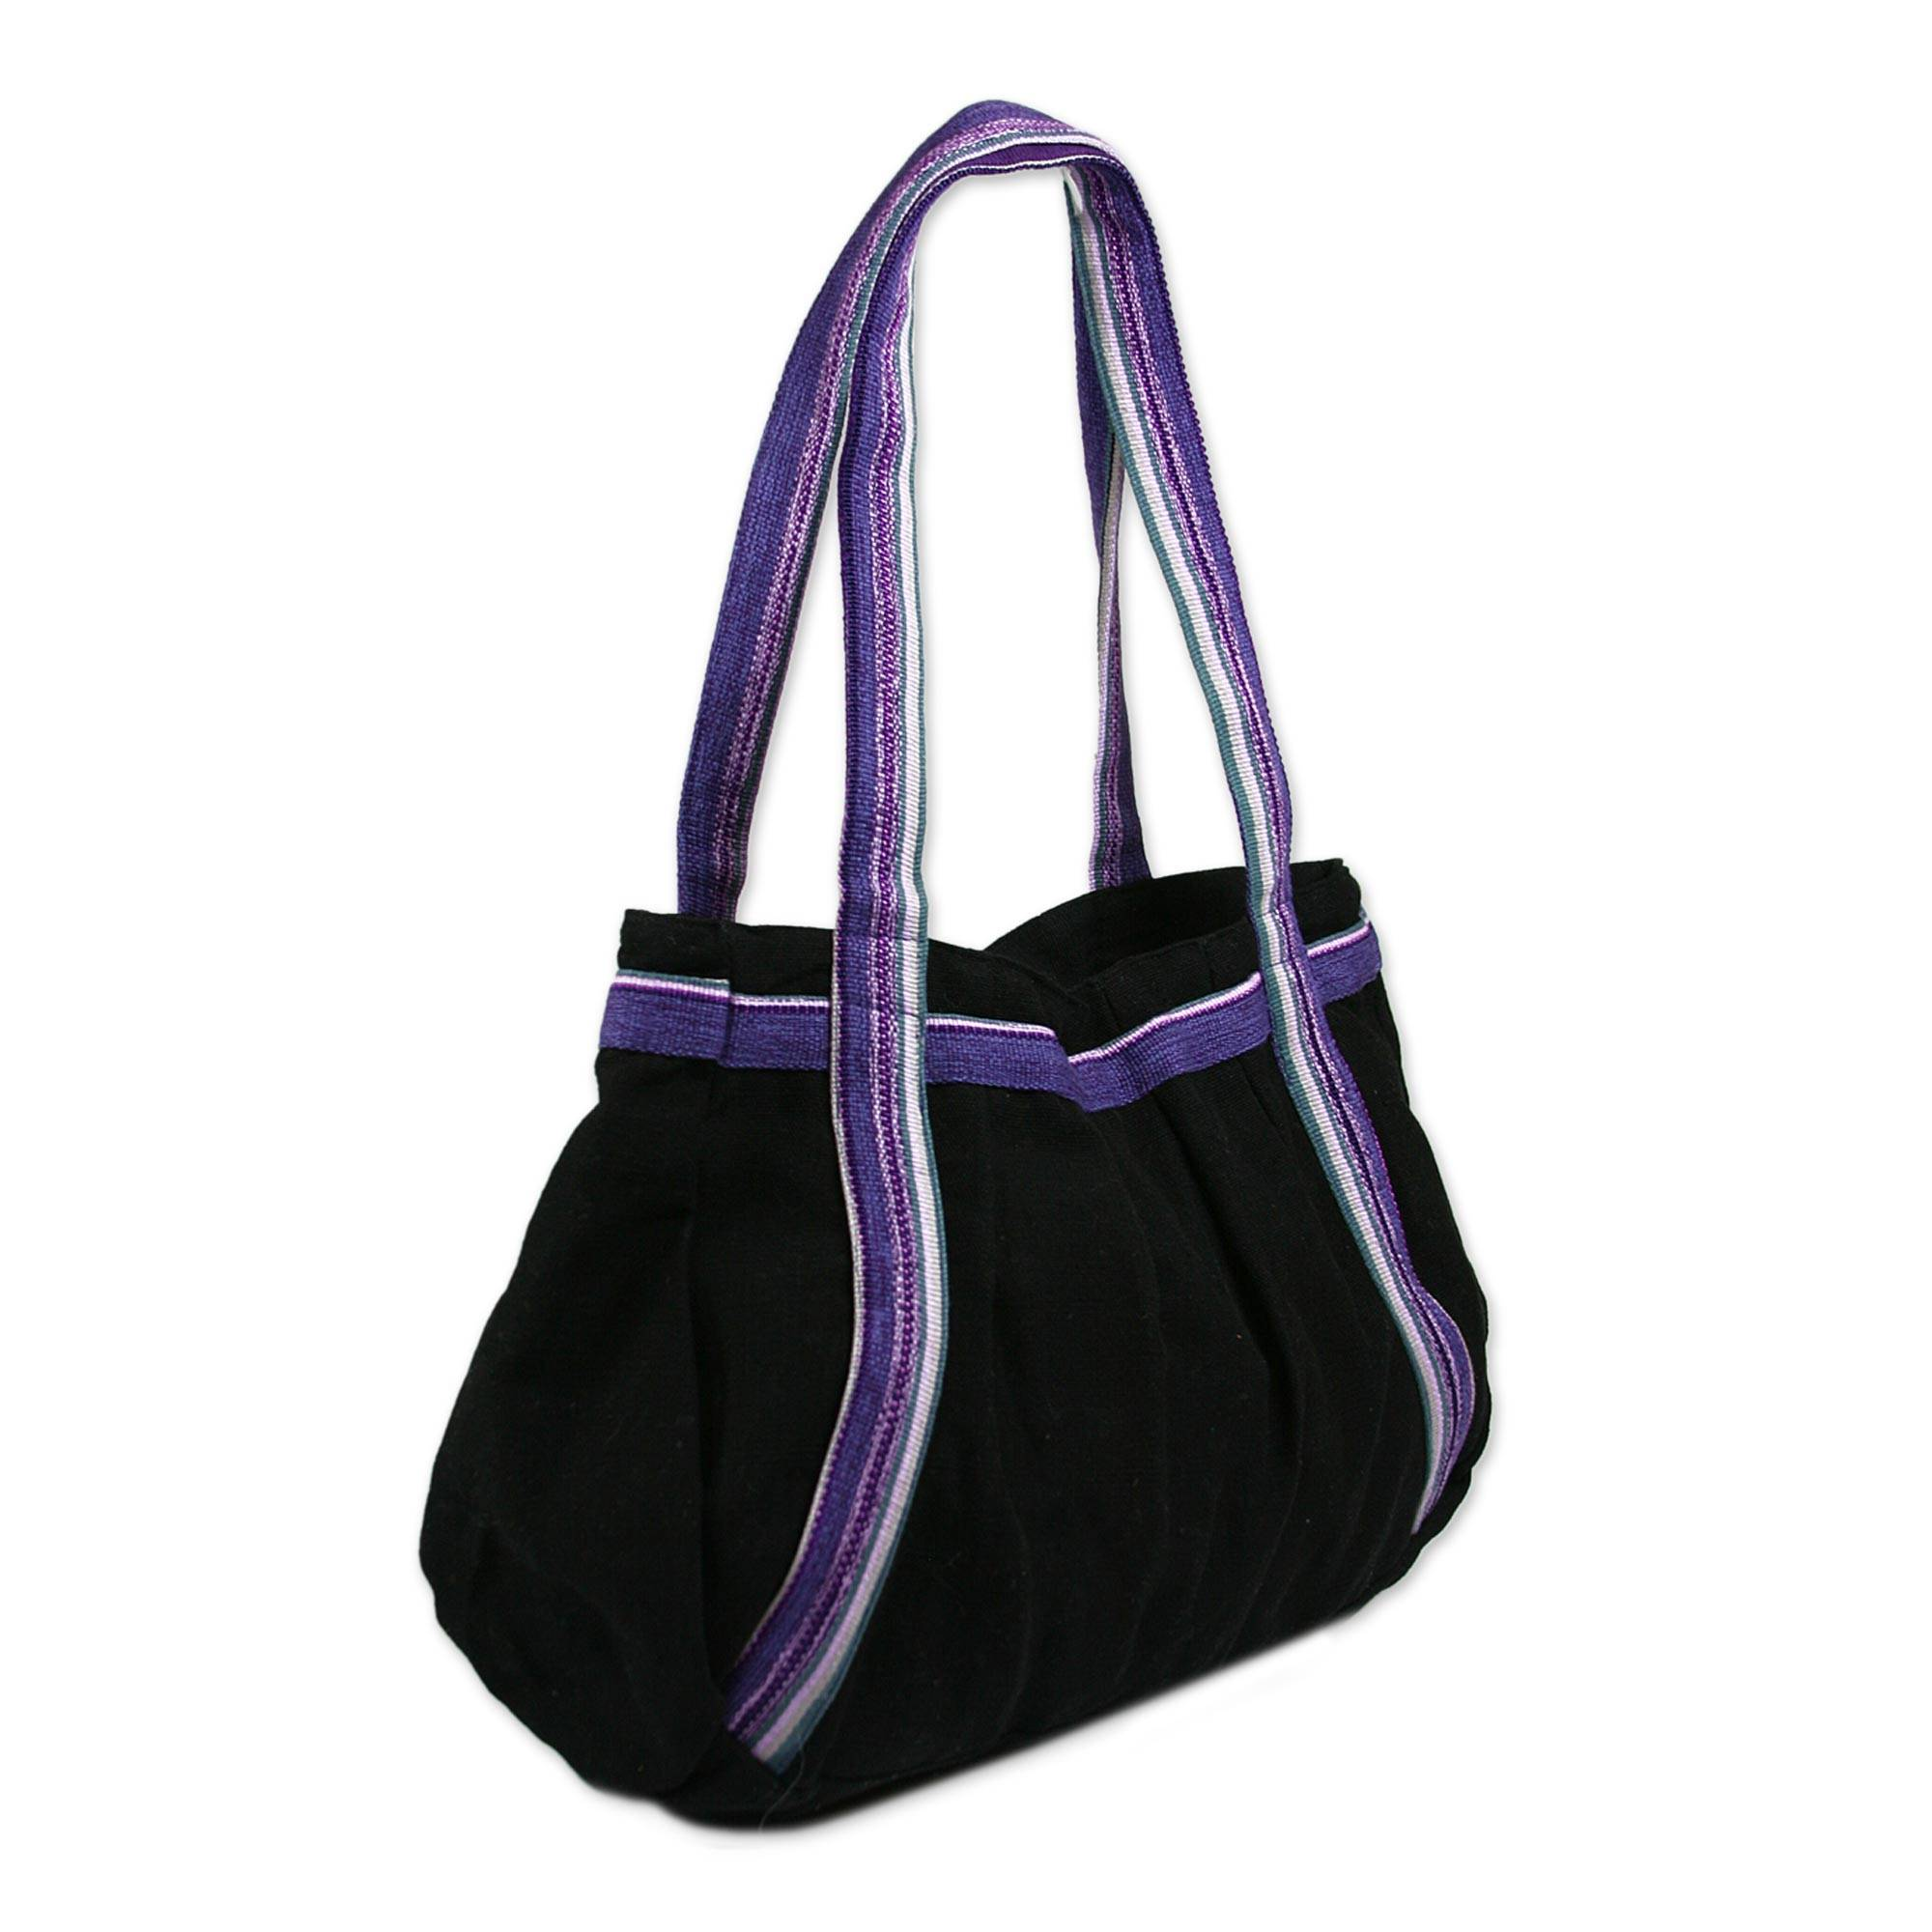 Unique Cotton Shoulder Bag Midnight Sonnet Novica Ready Nwt Maya Hobo Brown